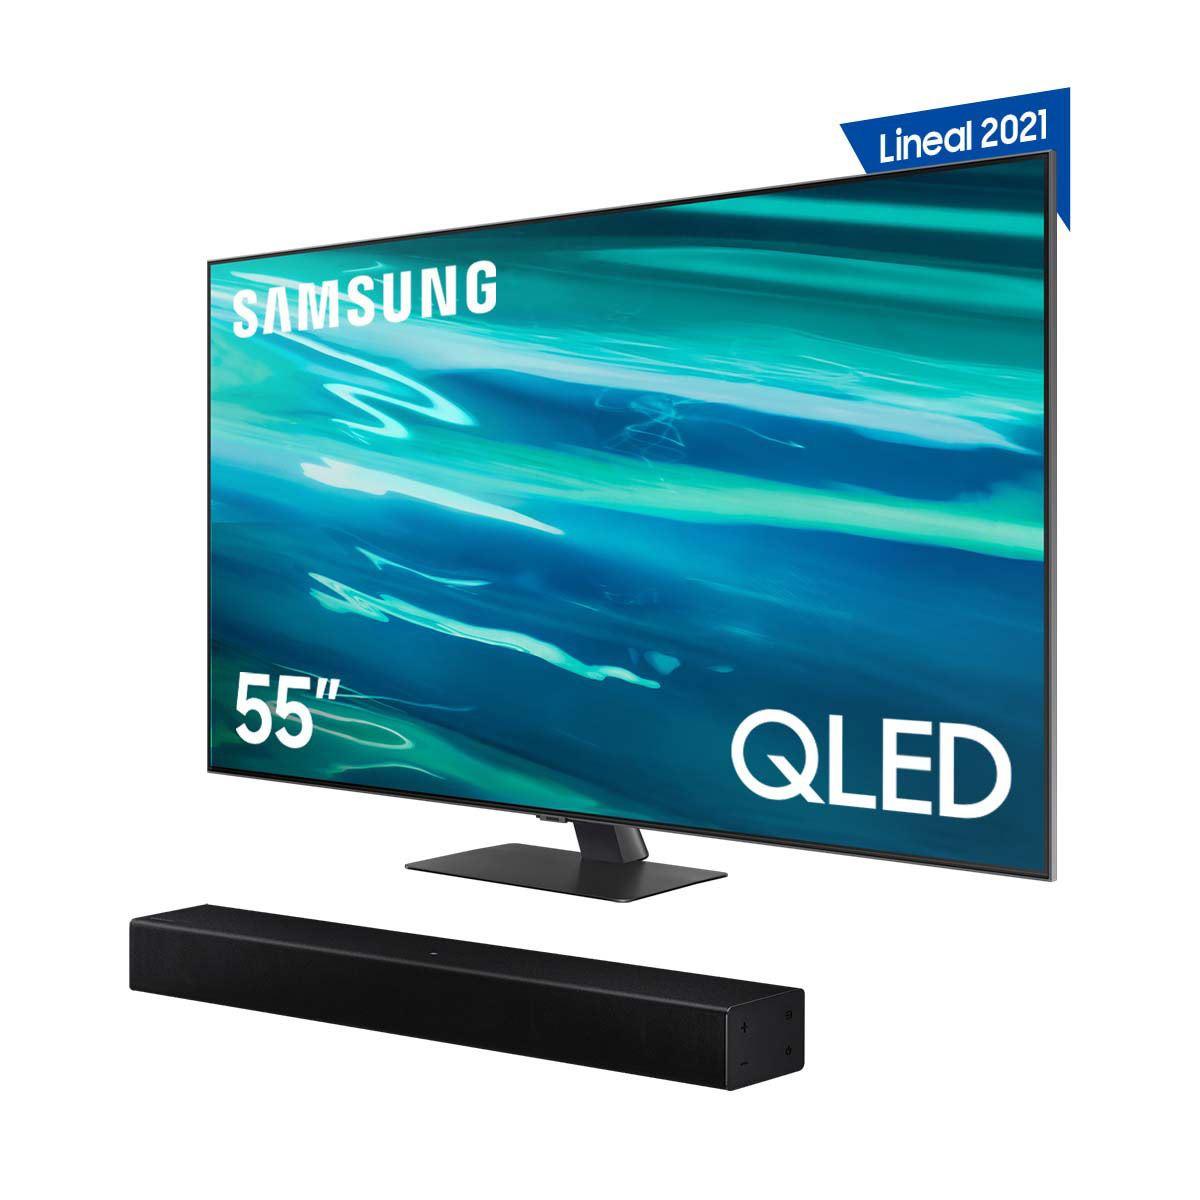 Paquete Smart TV QLED Samsung 55